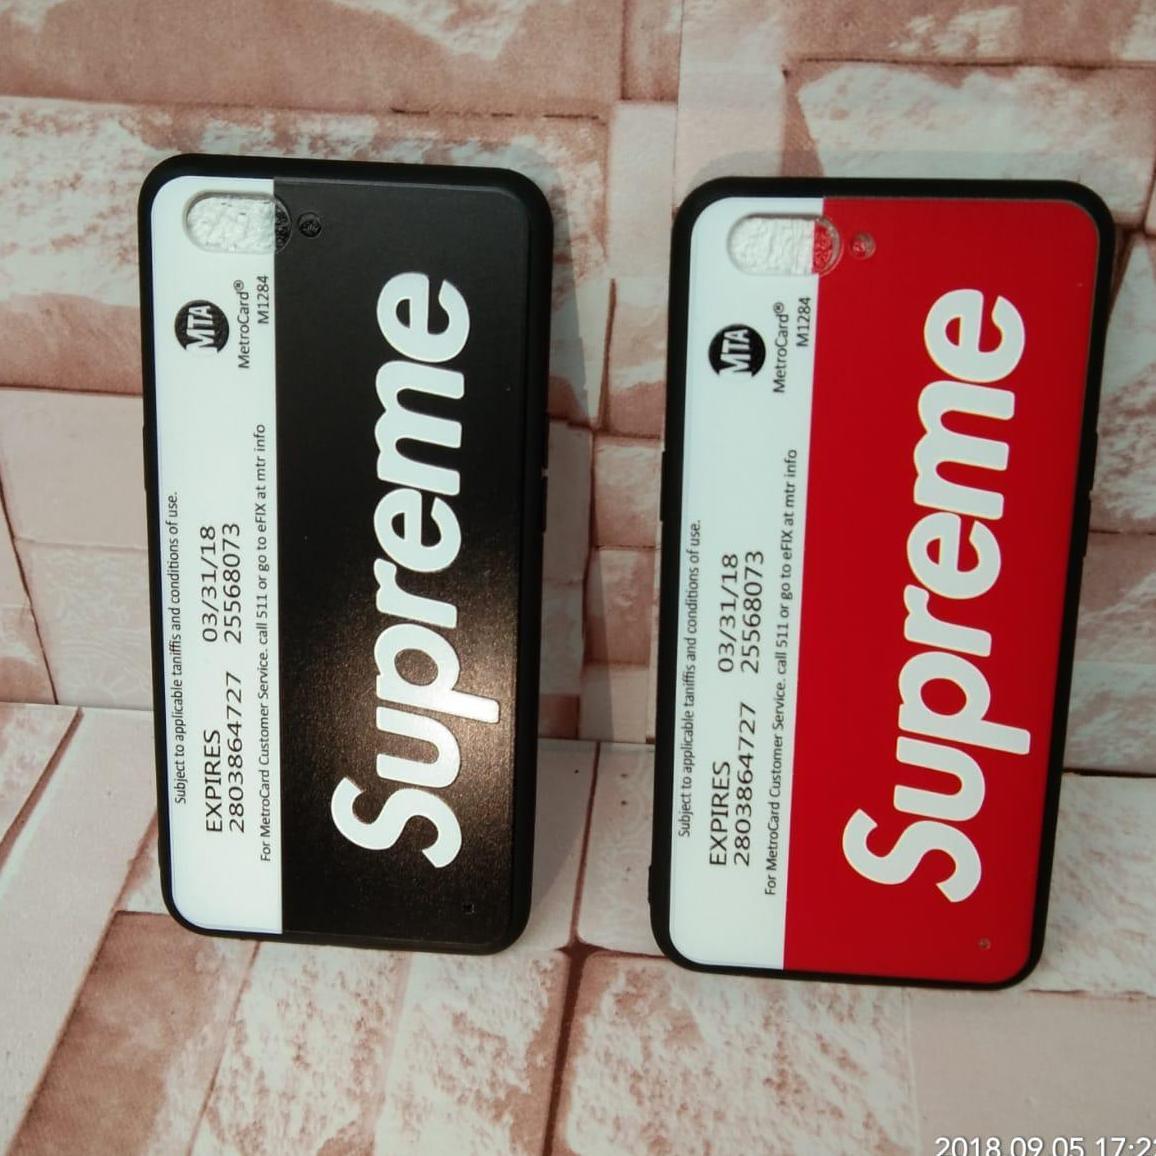 Supreme Softcase Oppo A3S - New York Subway (Oppo Tipe Terbaru)